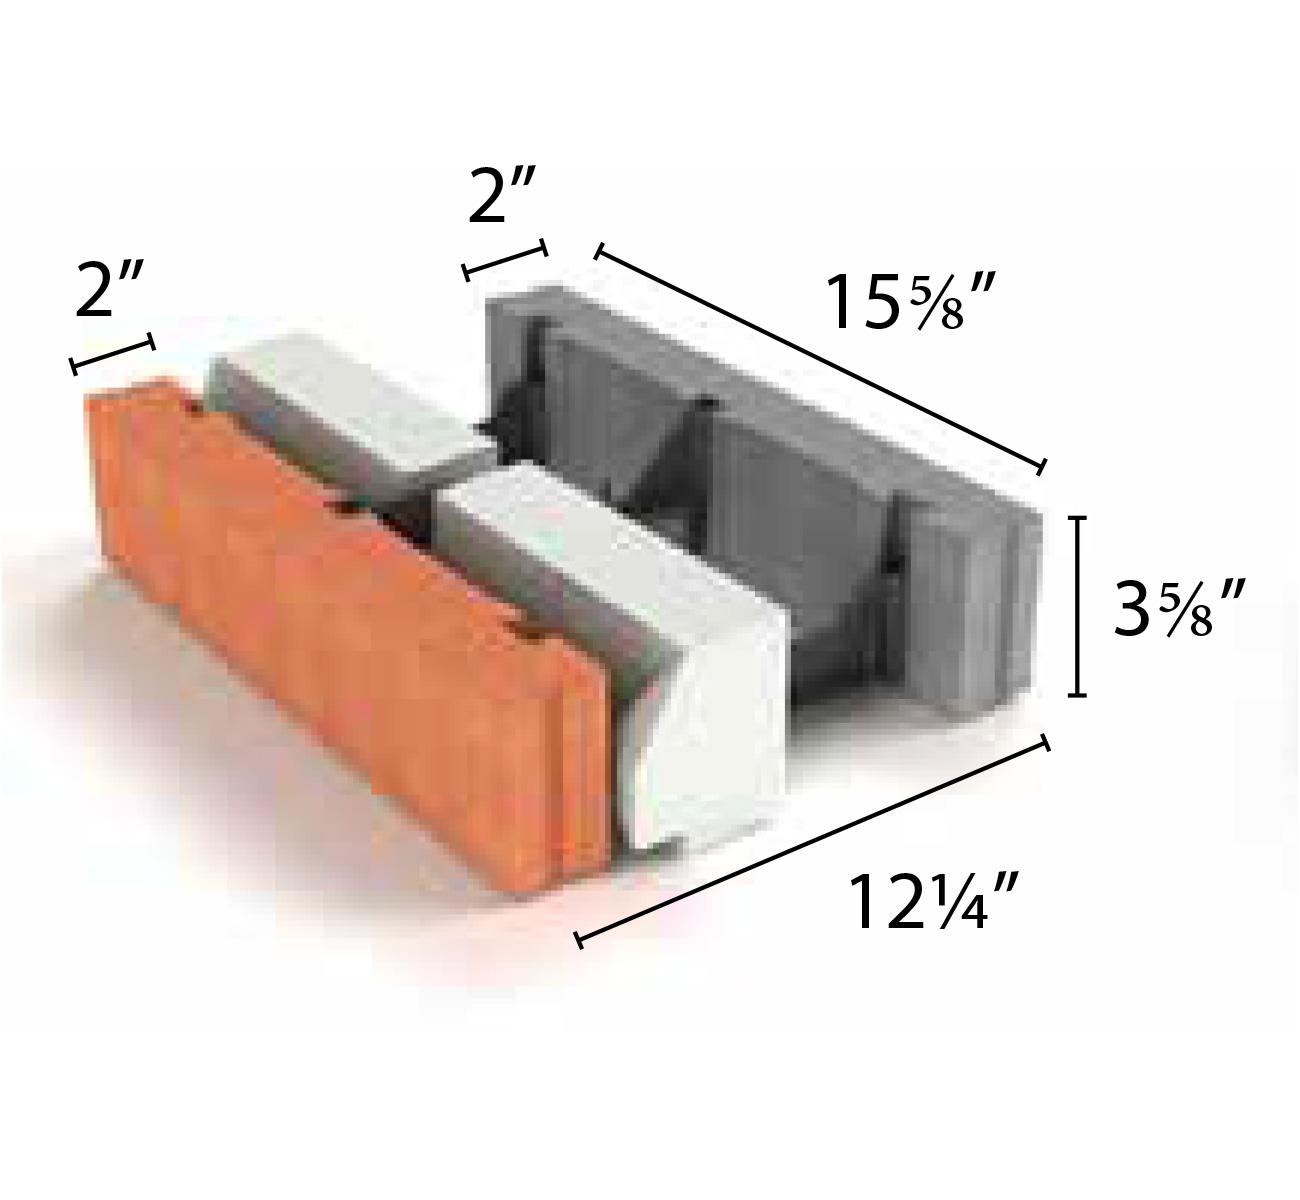 Split Face Blocks: Rough-Hewn Concrete Masonry Units from Echelon